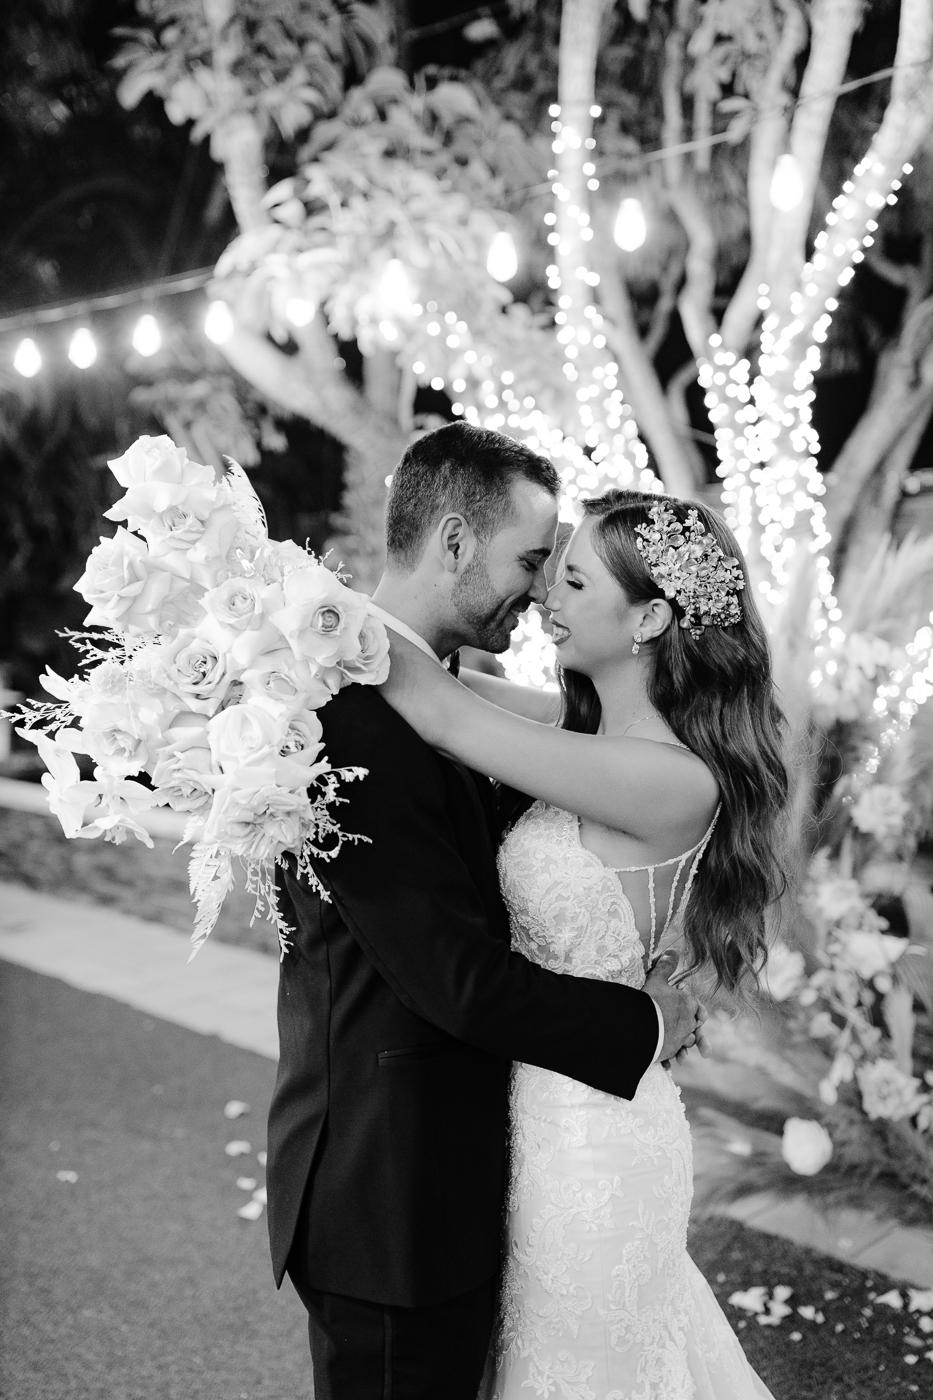 Karen & Caio – formal (4 of 5)